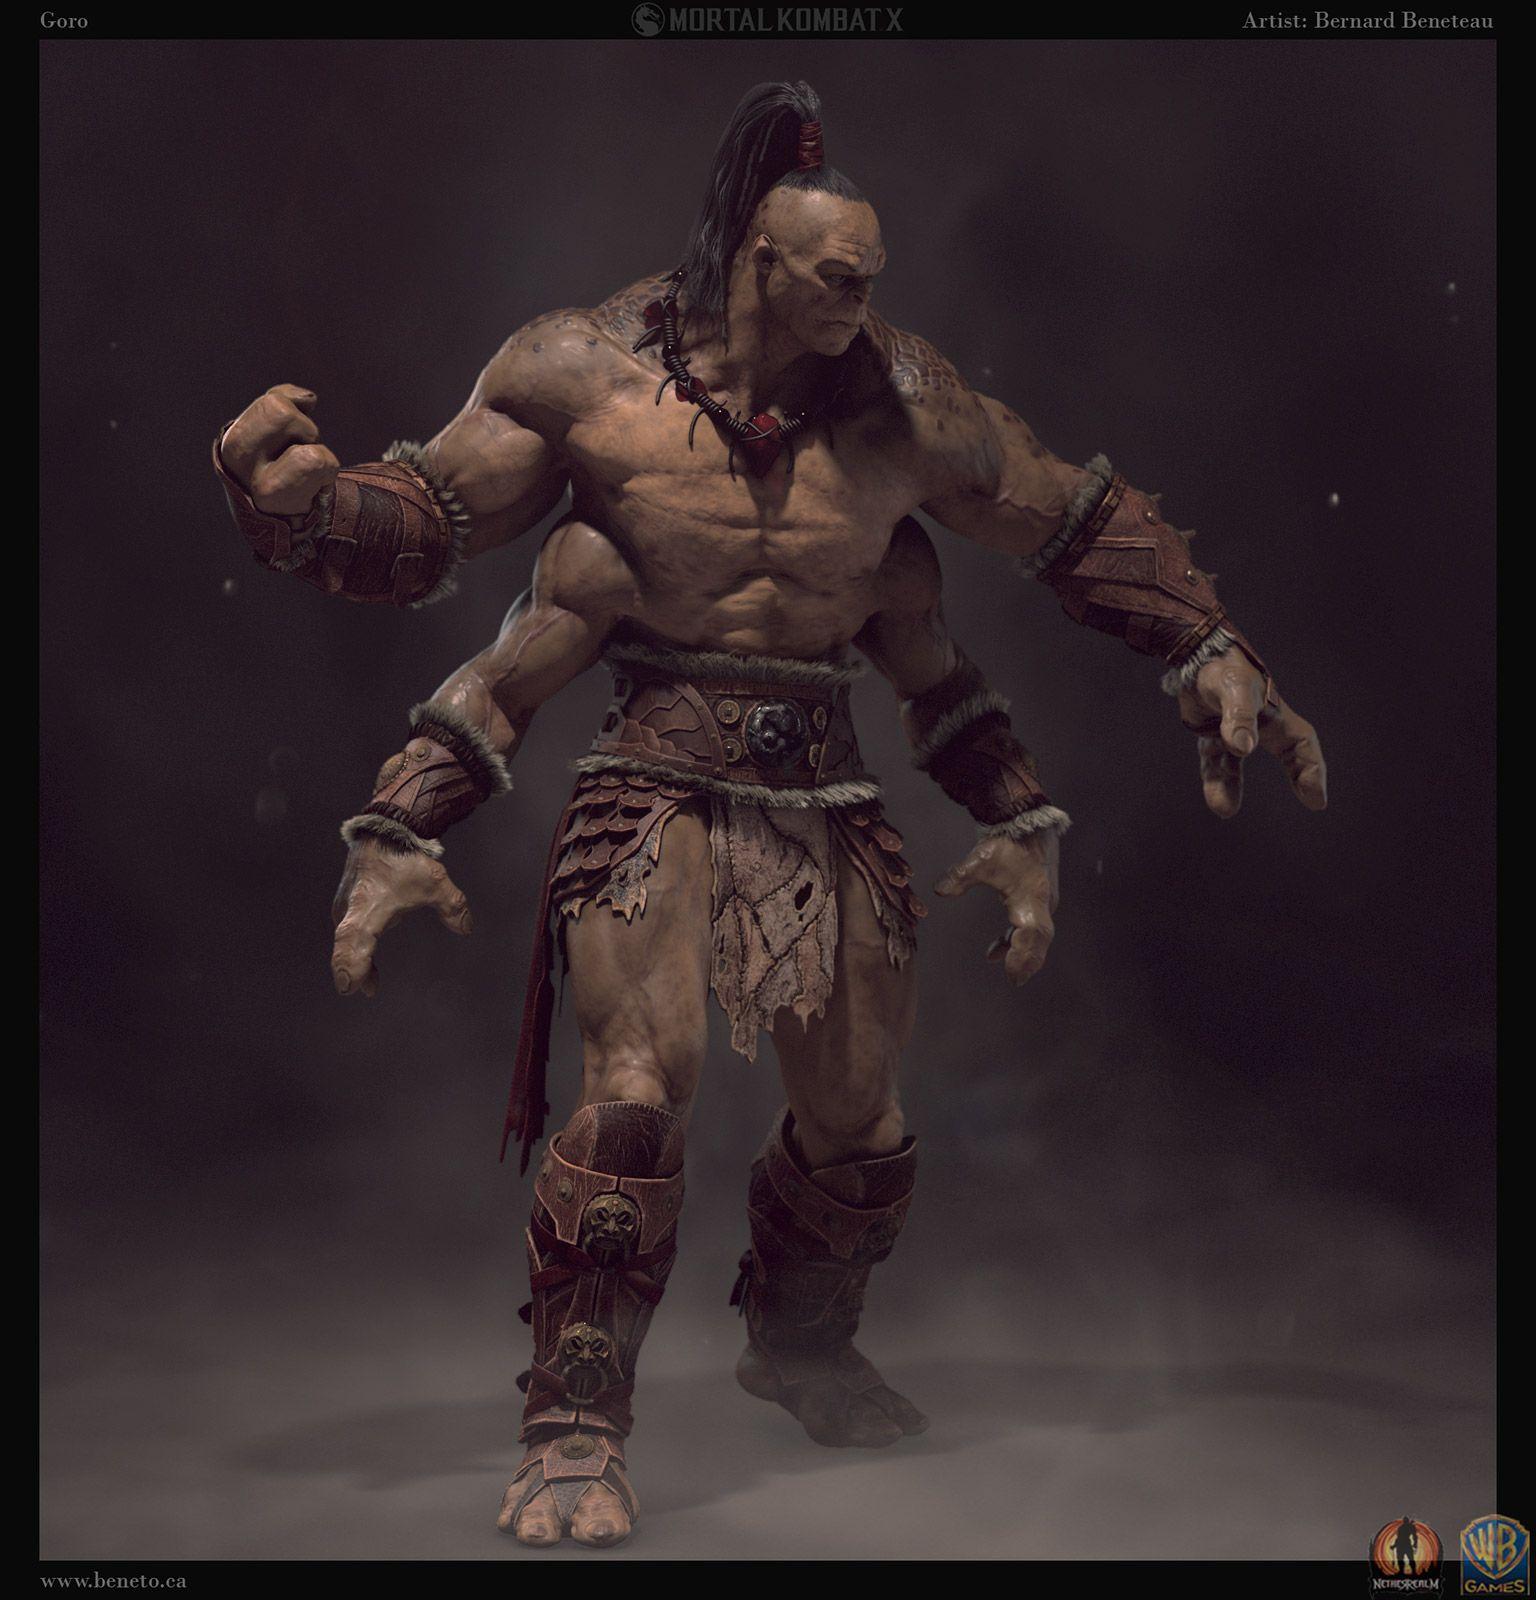 MK X- Goro by Bernard Beneteau | Fantasy | 3D | Mortal kombat art, Mortal  kombat x, Mortal kombat